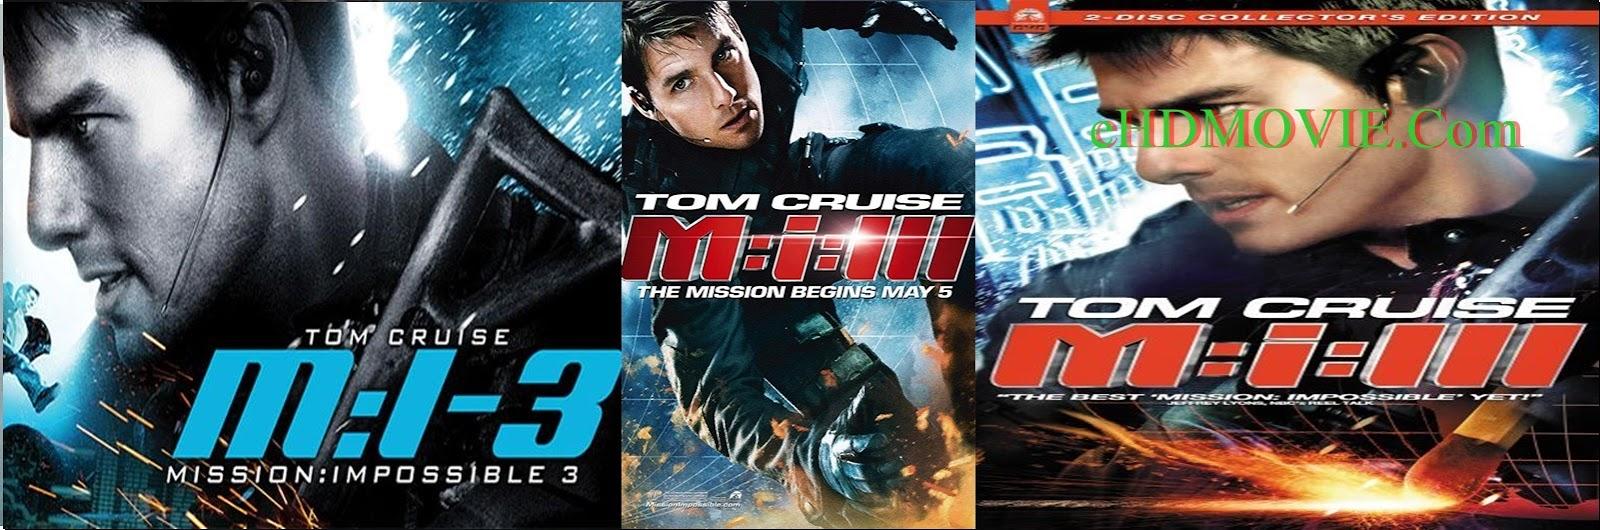 Mission: Impossible III 2006 Full Movie Dual Audio [Hindi – English] 1080p - 720p - 480p ORG BRRip 350MB - 850MB - 2.5GB ESubs Free Download